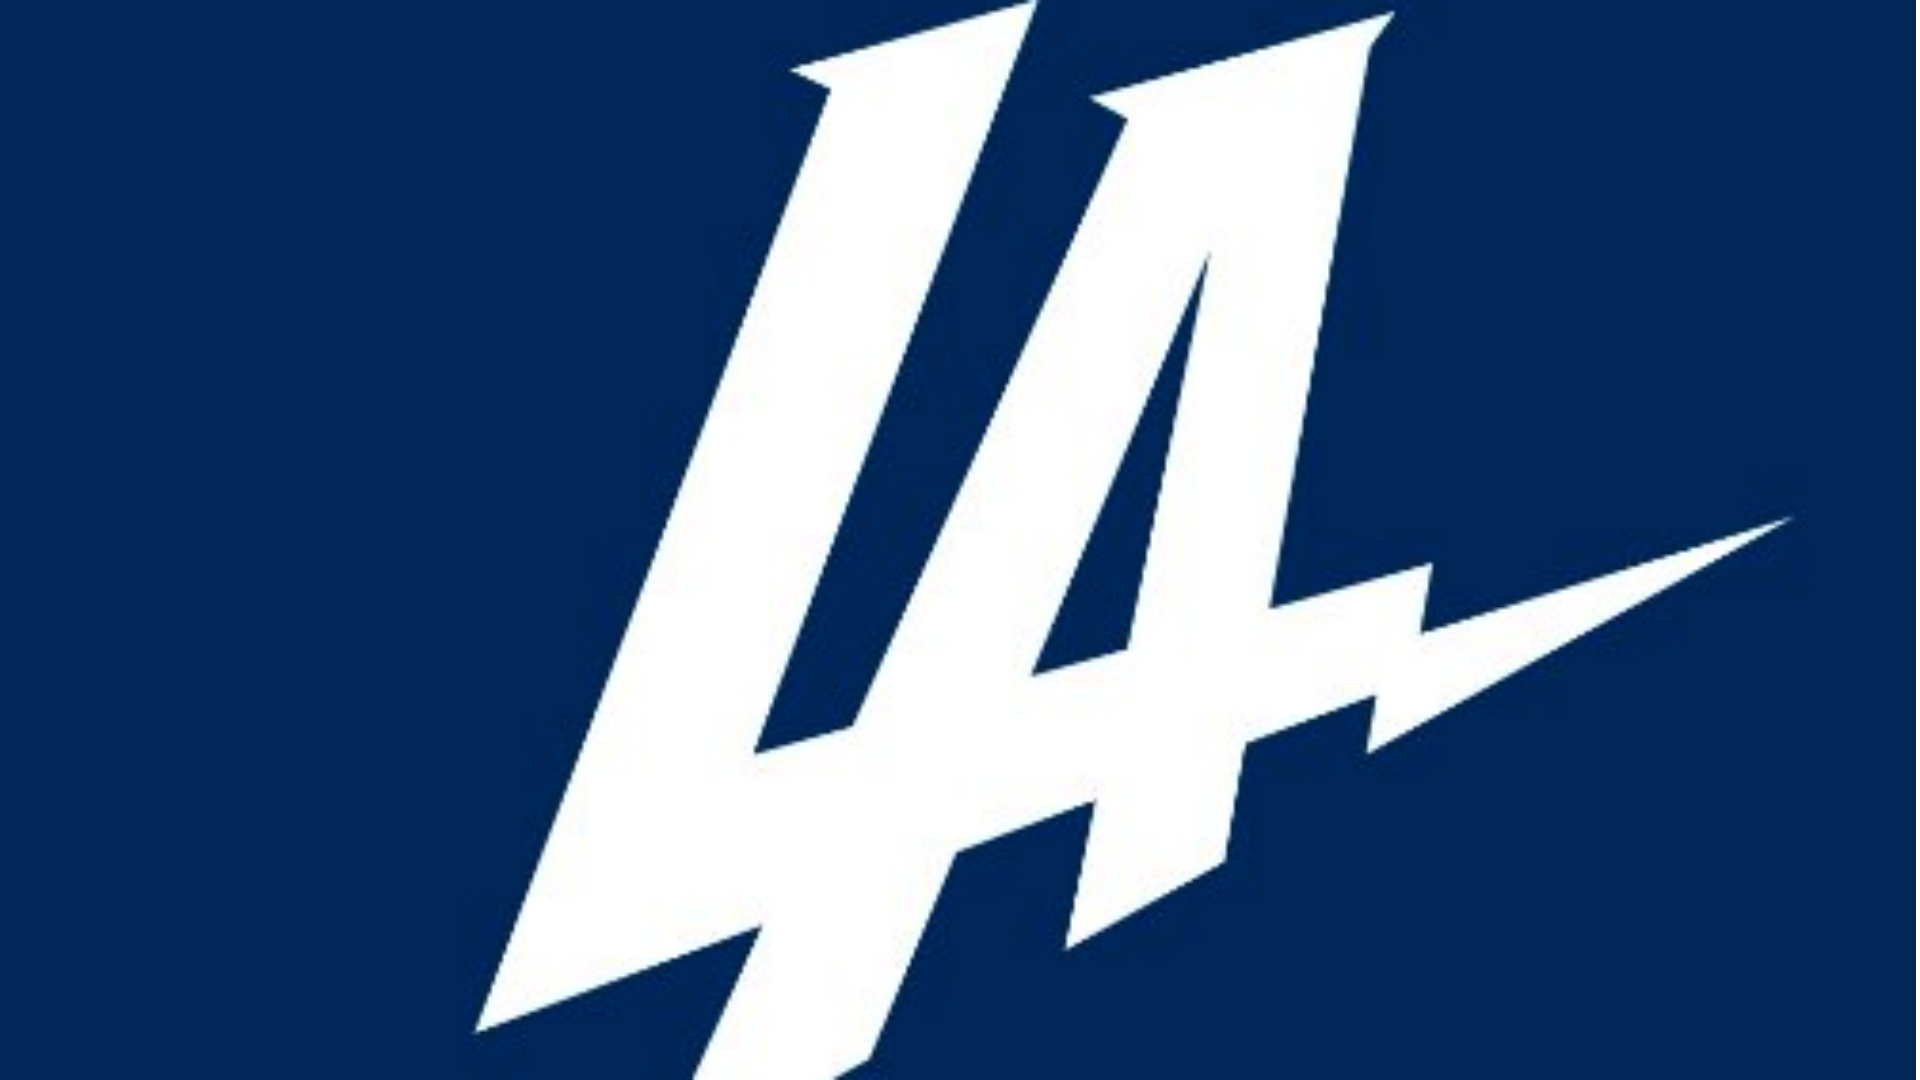 Chargers admit error, drop new LA logo after criticism.